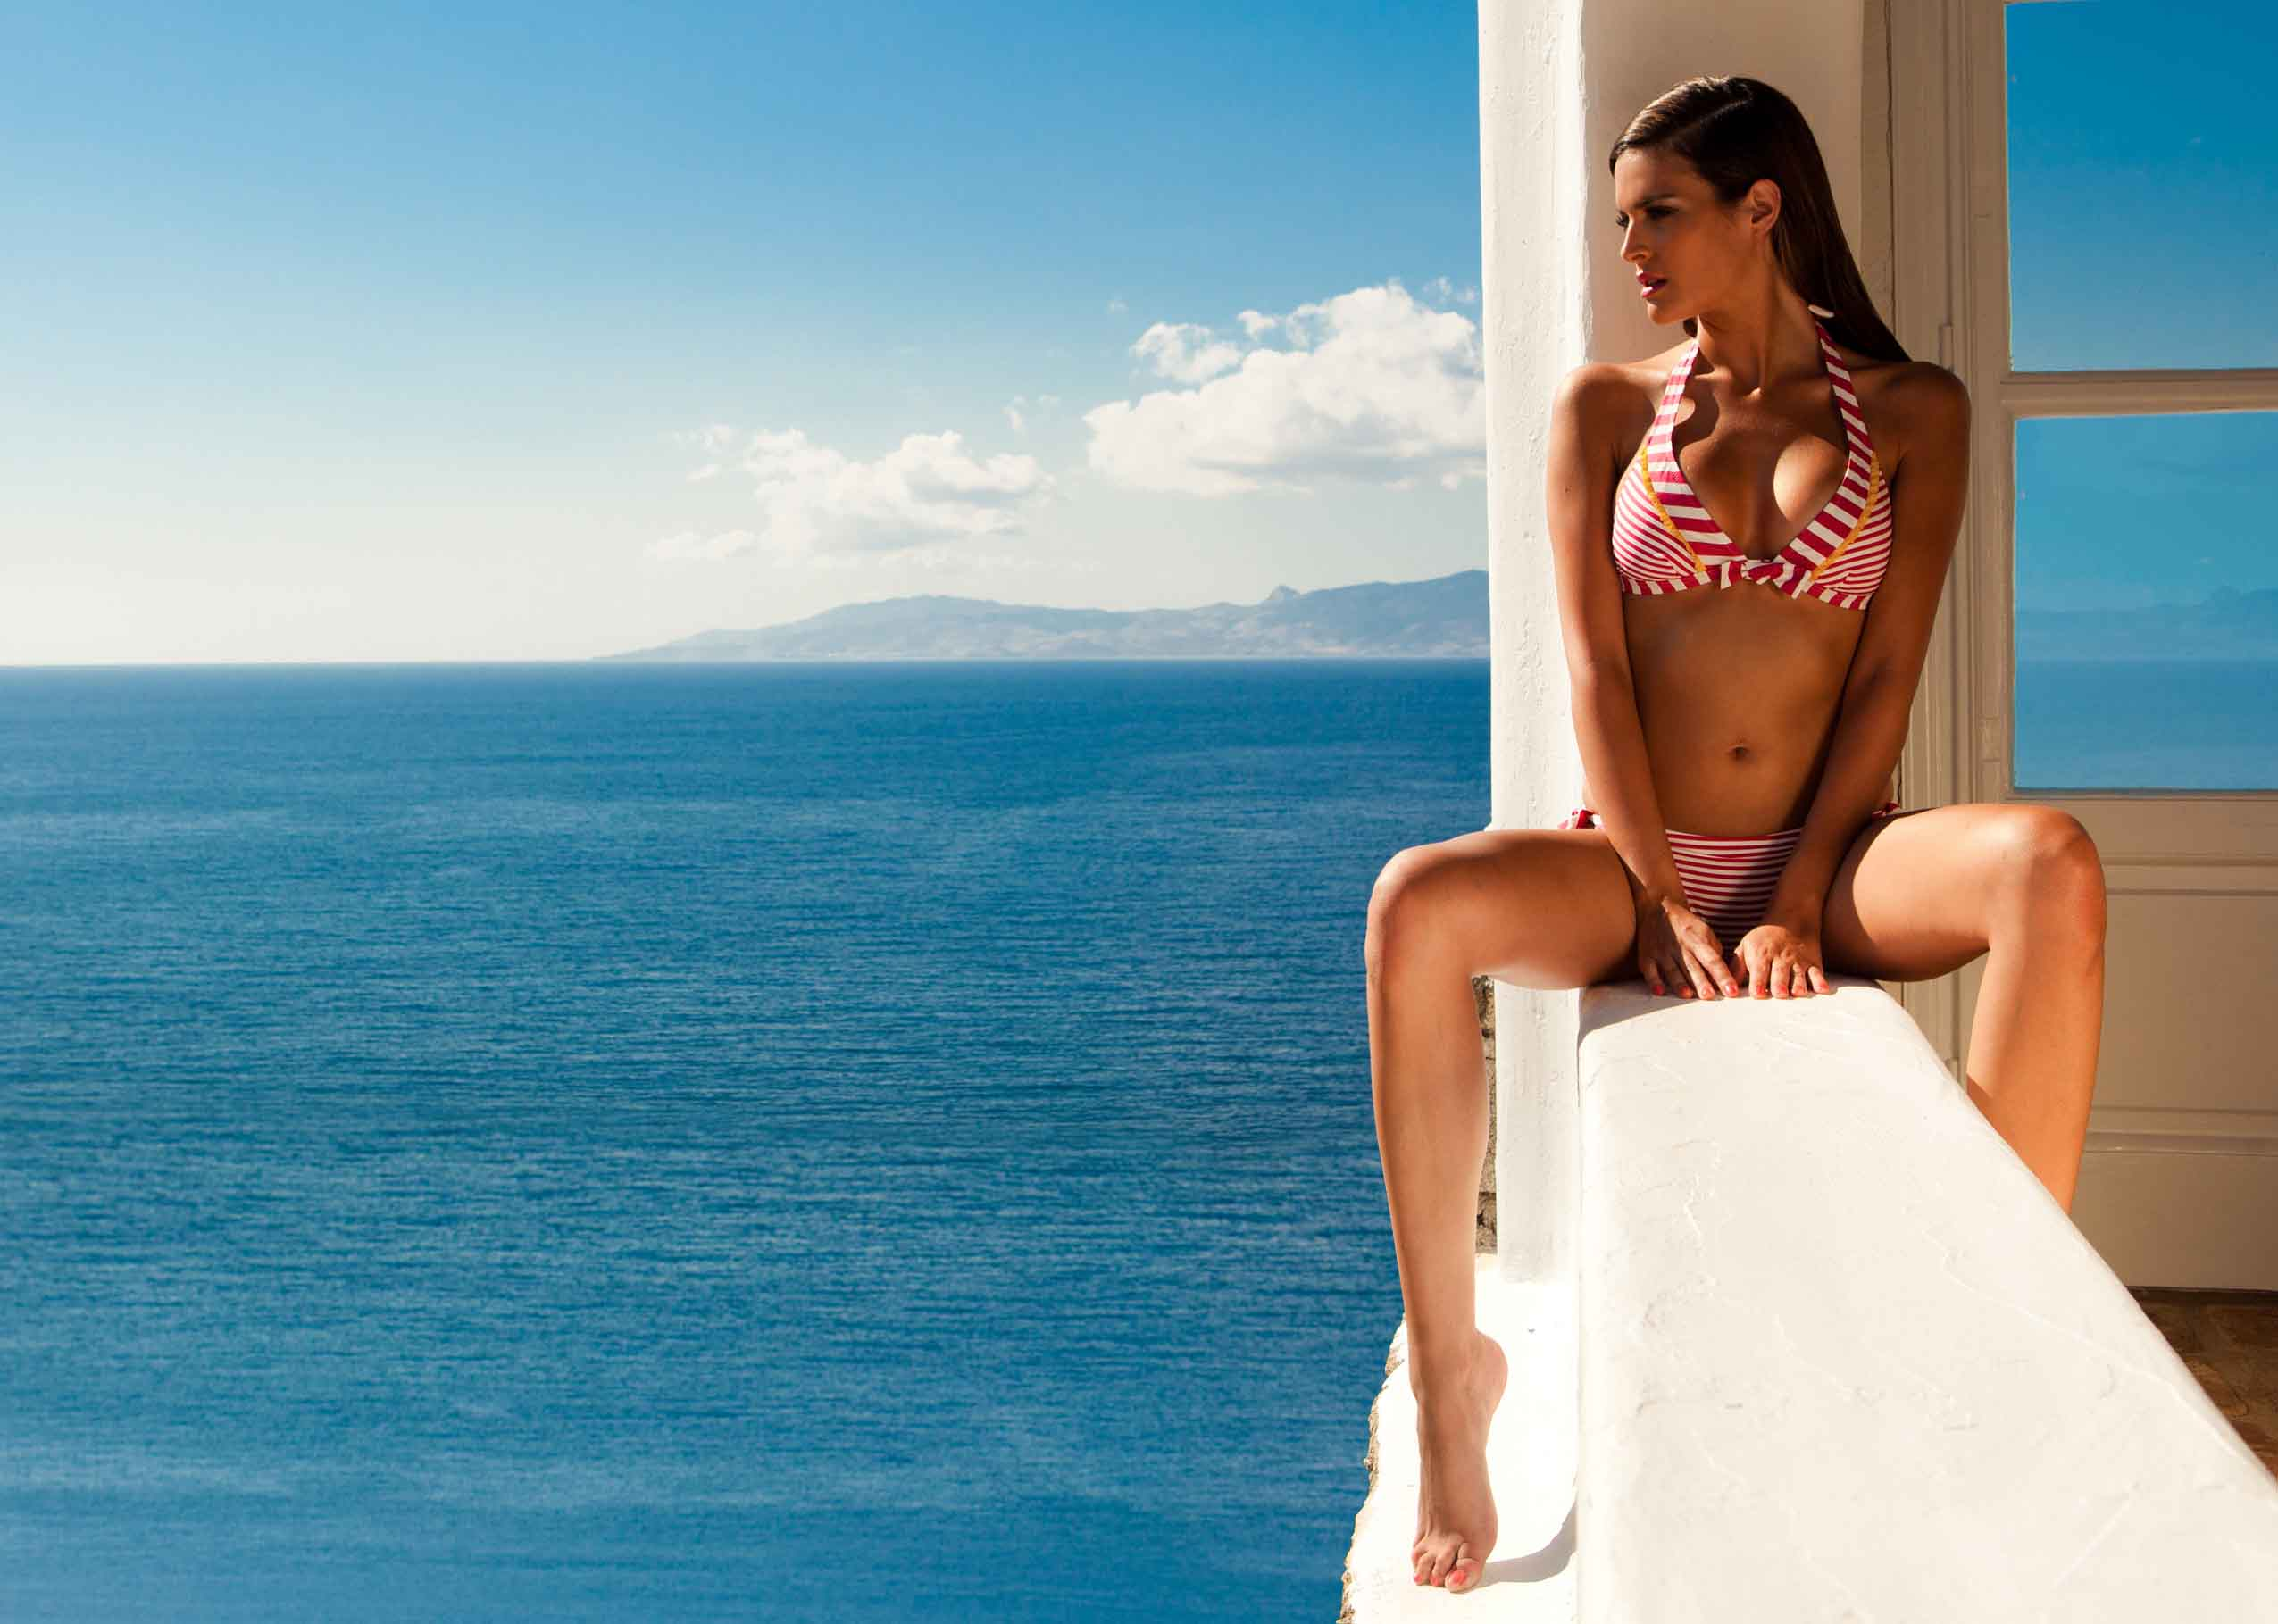 Фото испанских девушек на пляже 10 фотография